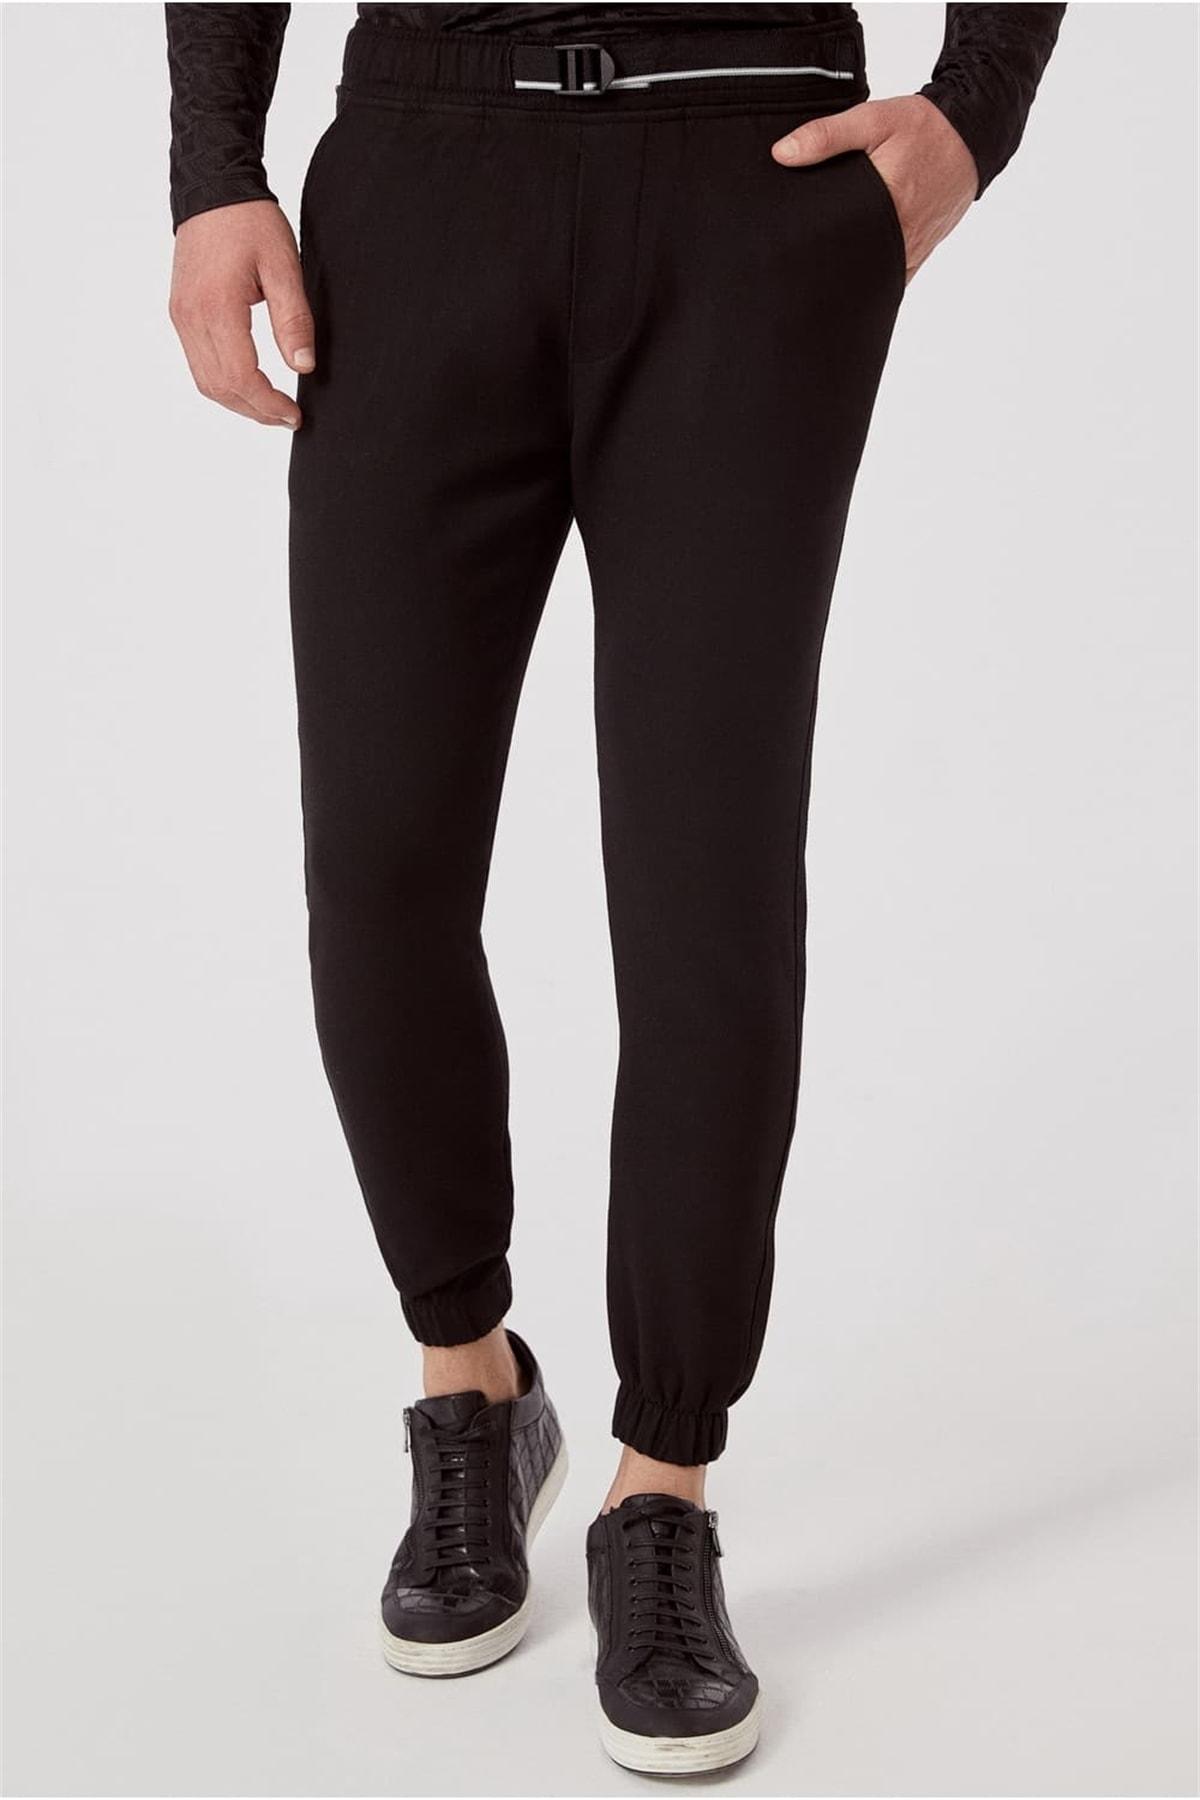 Efor ATP 017 Slim Fit Siyah Spor Pantolon 0